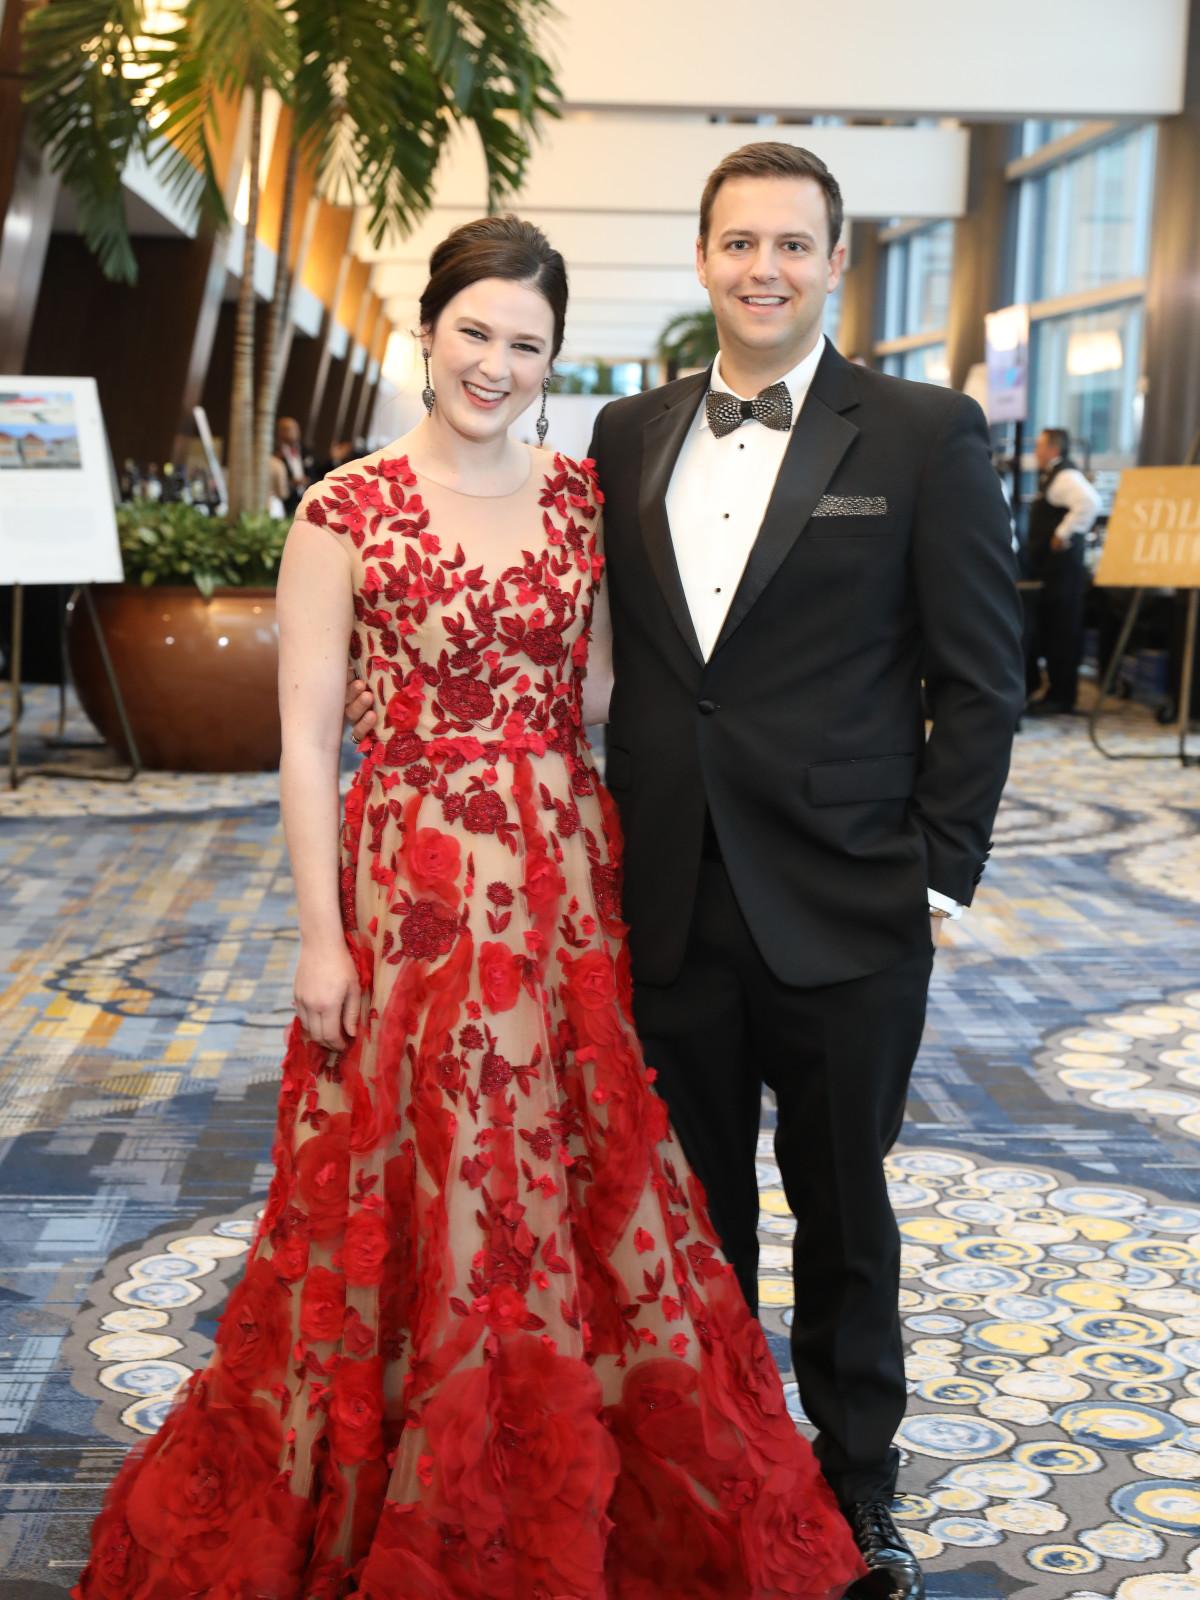 Heart Ball 2020 Rachel and Tim Dash